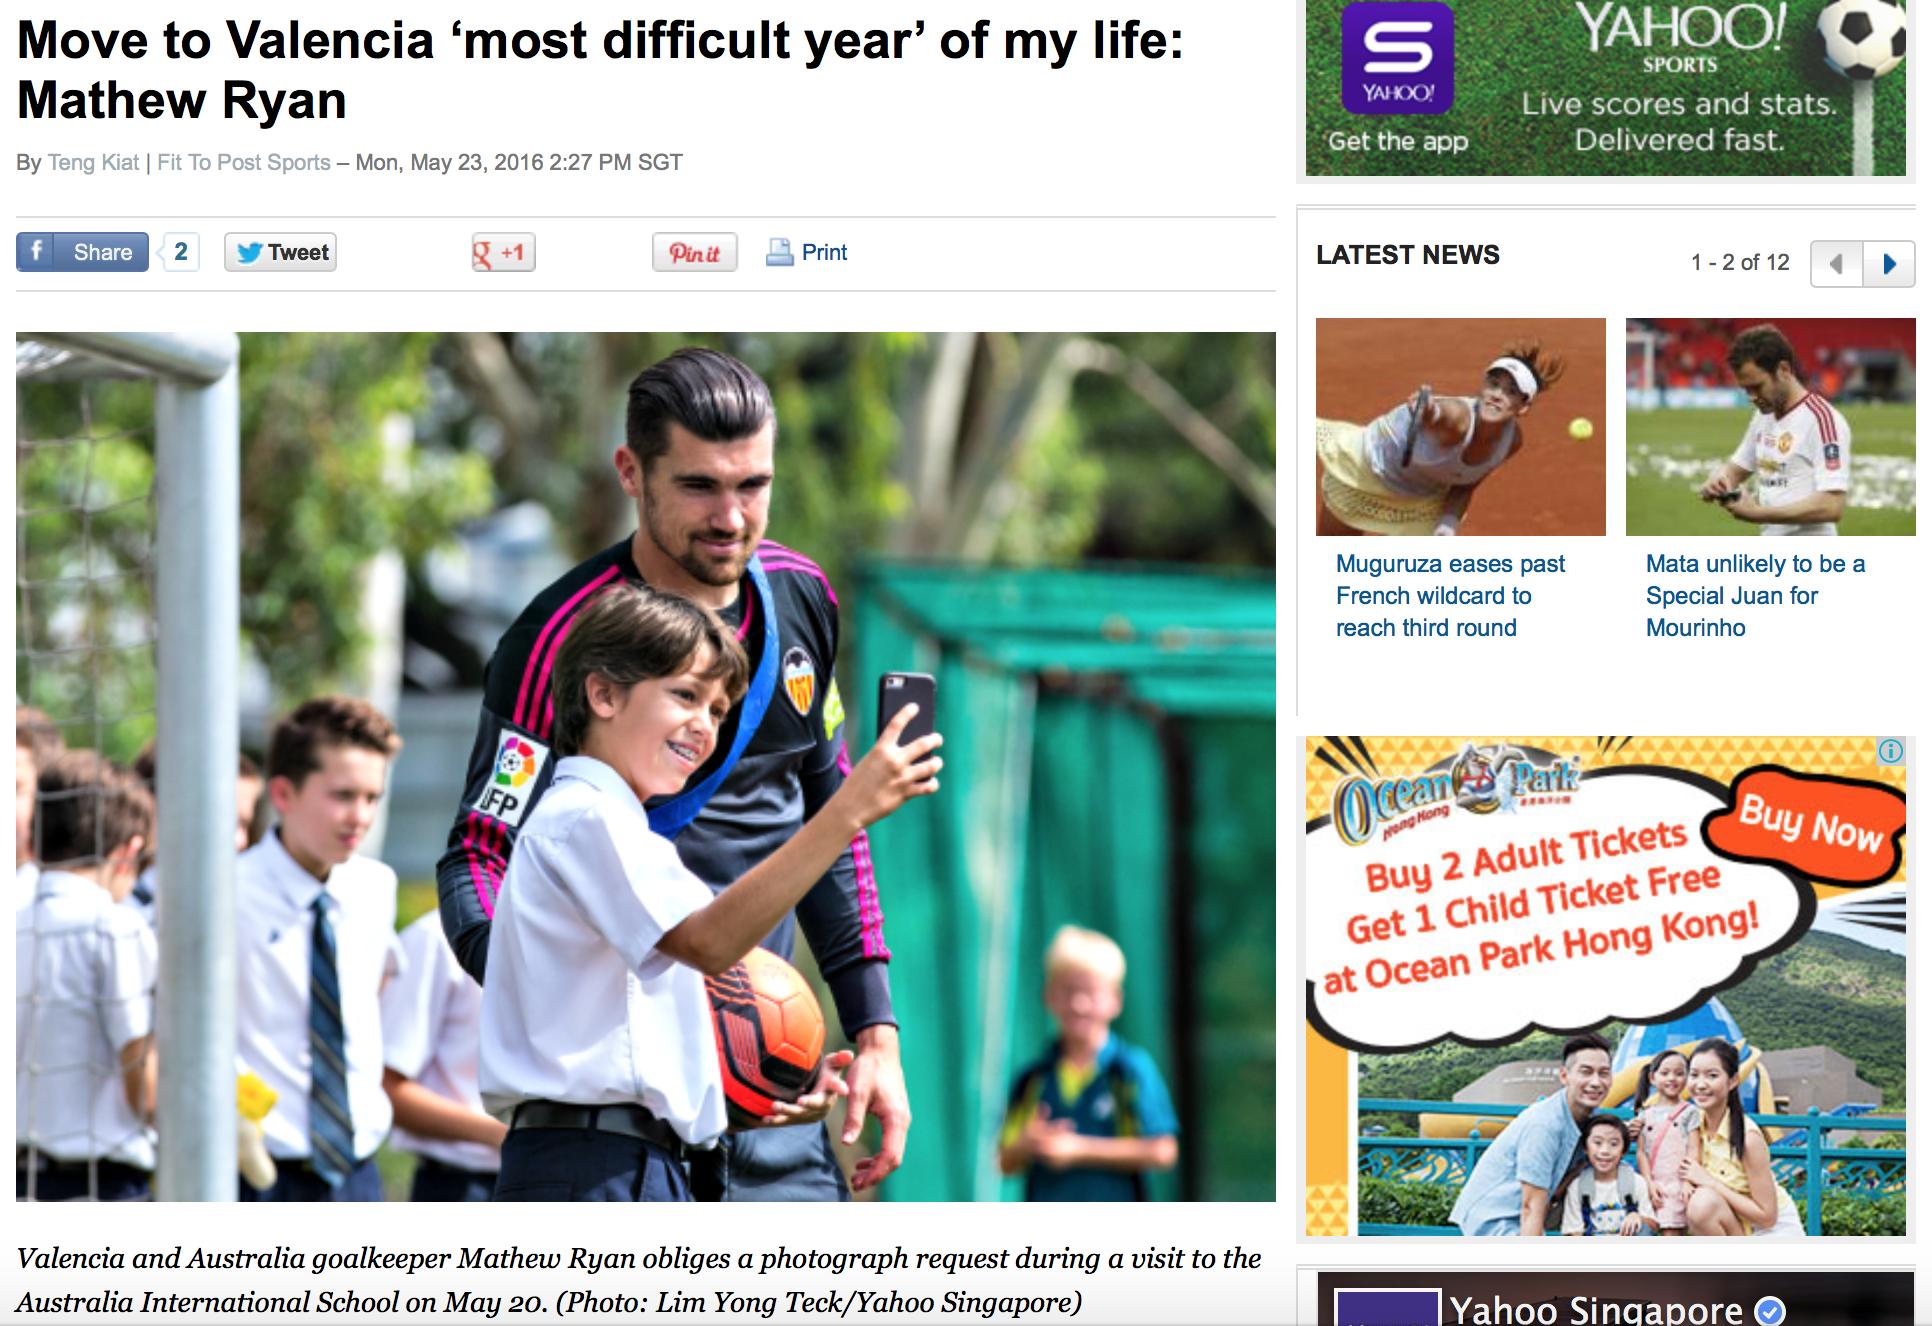 Valencia CF feature for Yahoo! (www.yahoo.com)